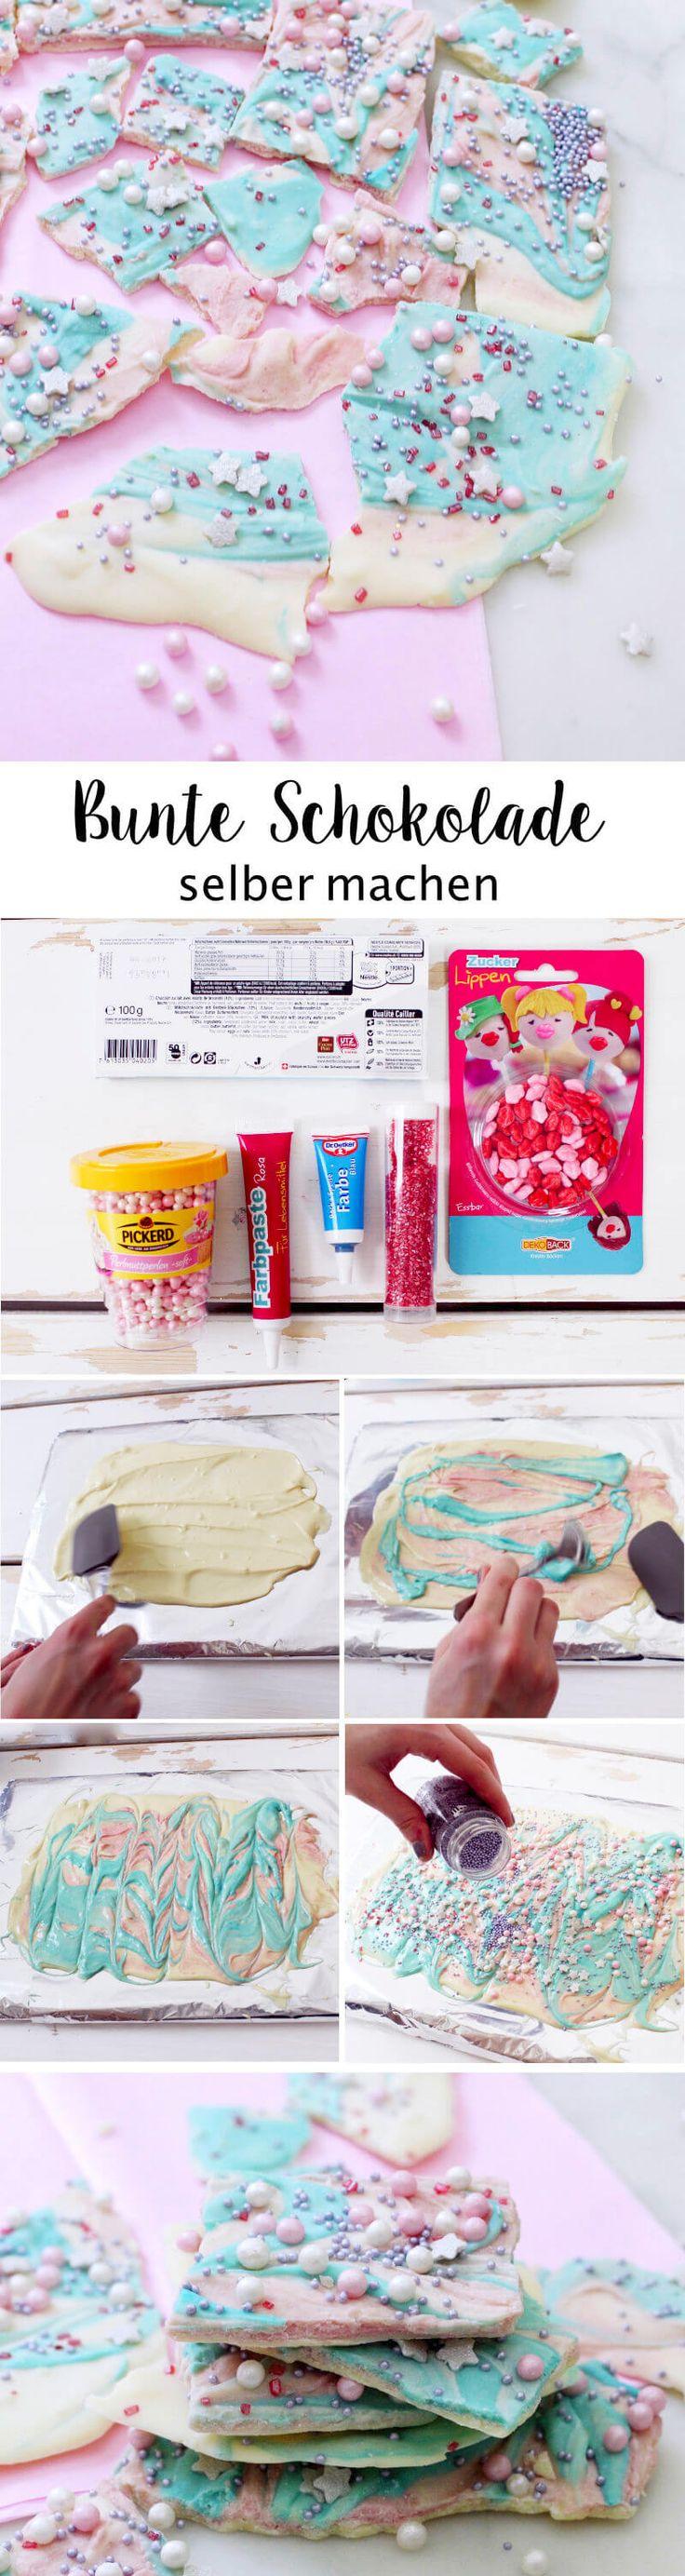 979 best Kuchen Backen - Rezepte images on Pinterest | Petit fours ...